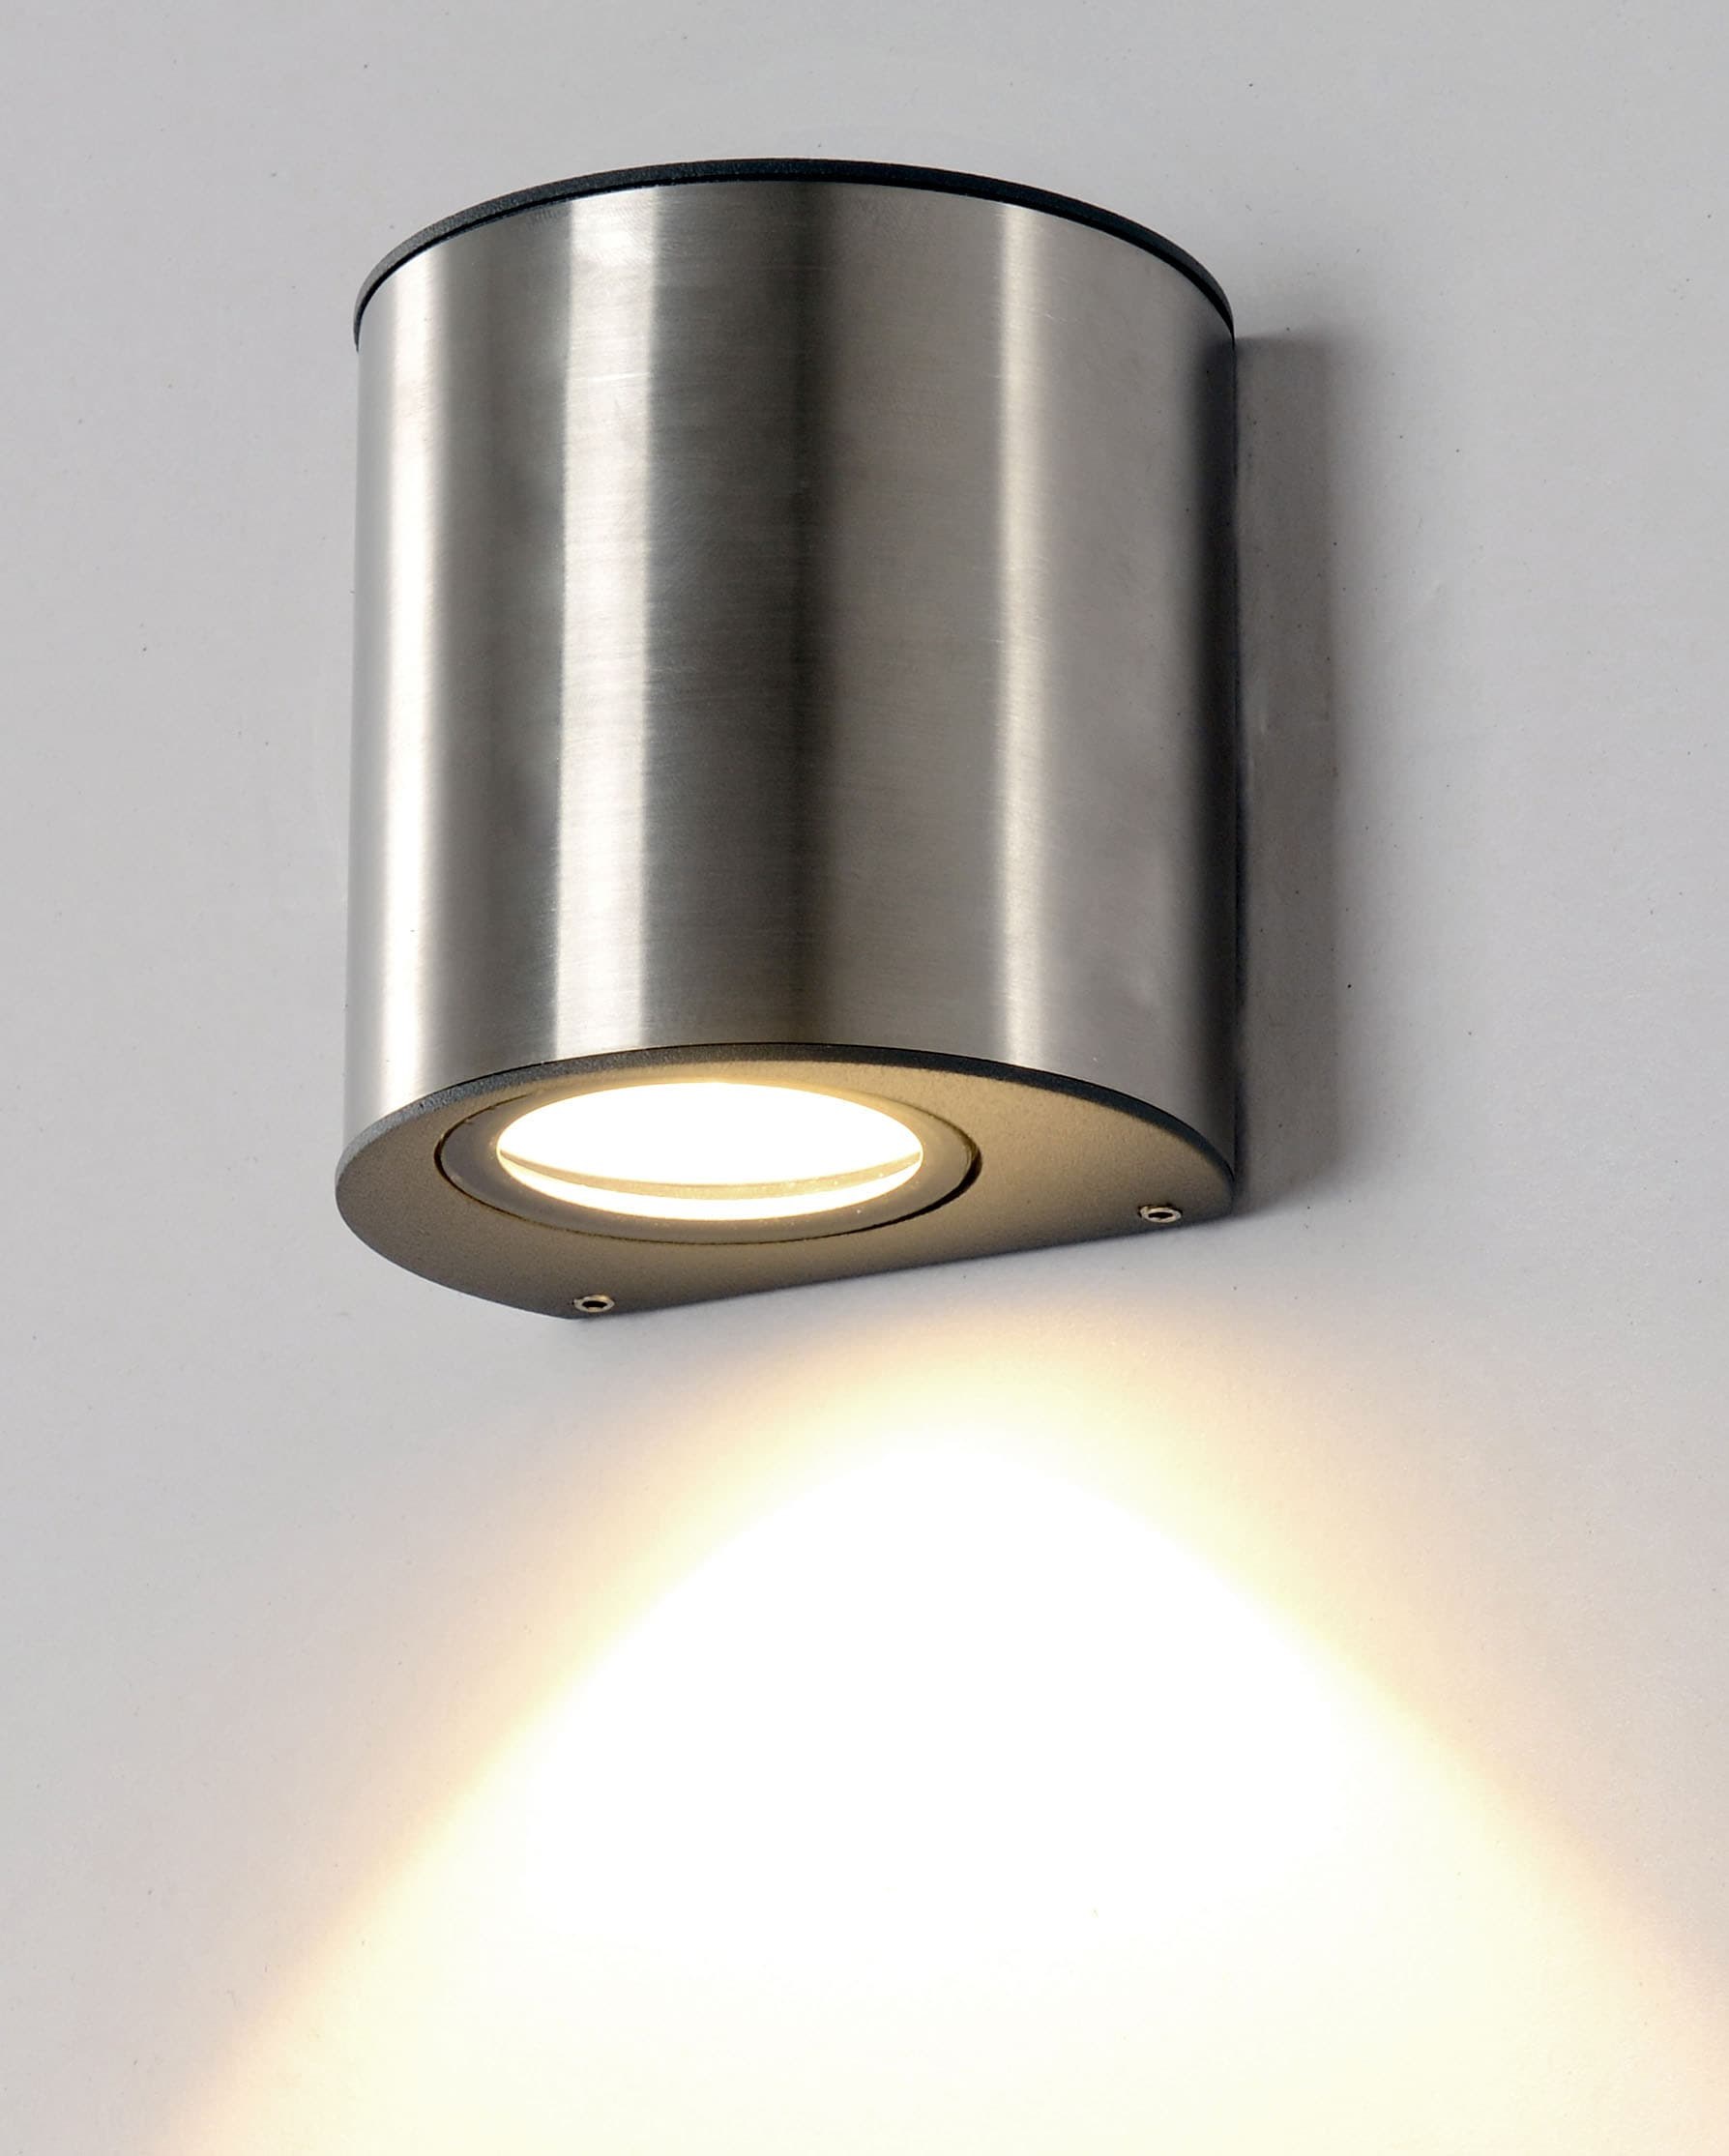 LUTEC LED Außen-Wandleuchte Ilumi ST5010, LED-Modul, 1 St.